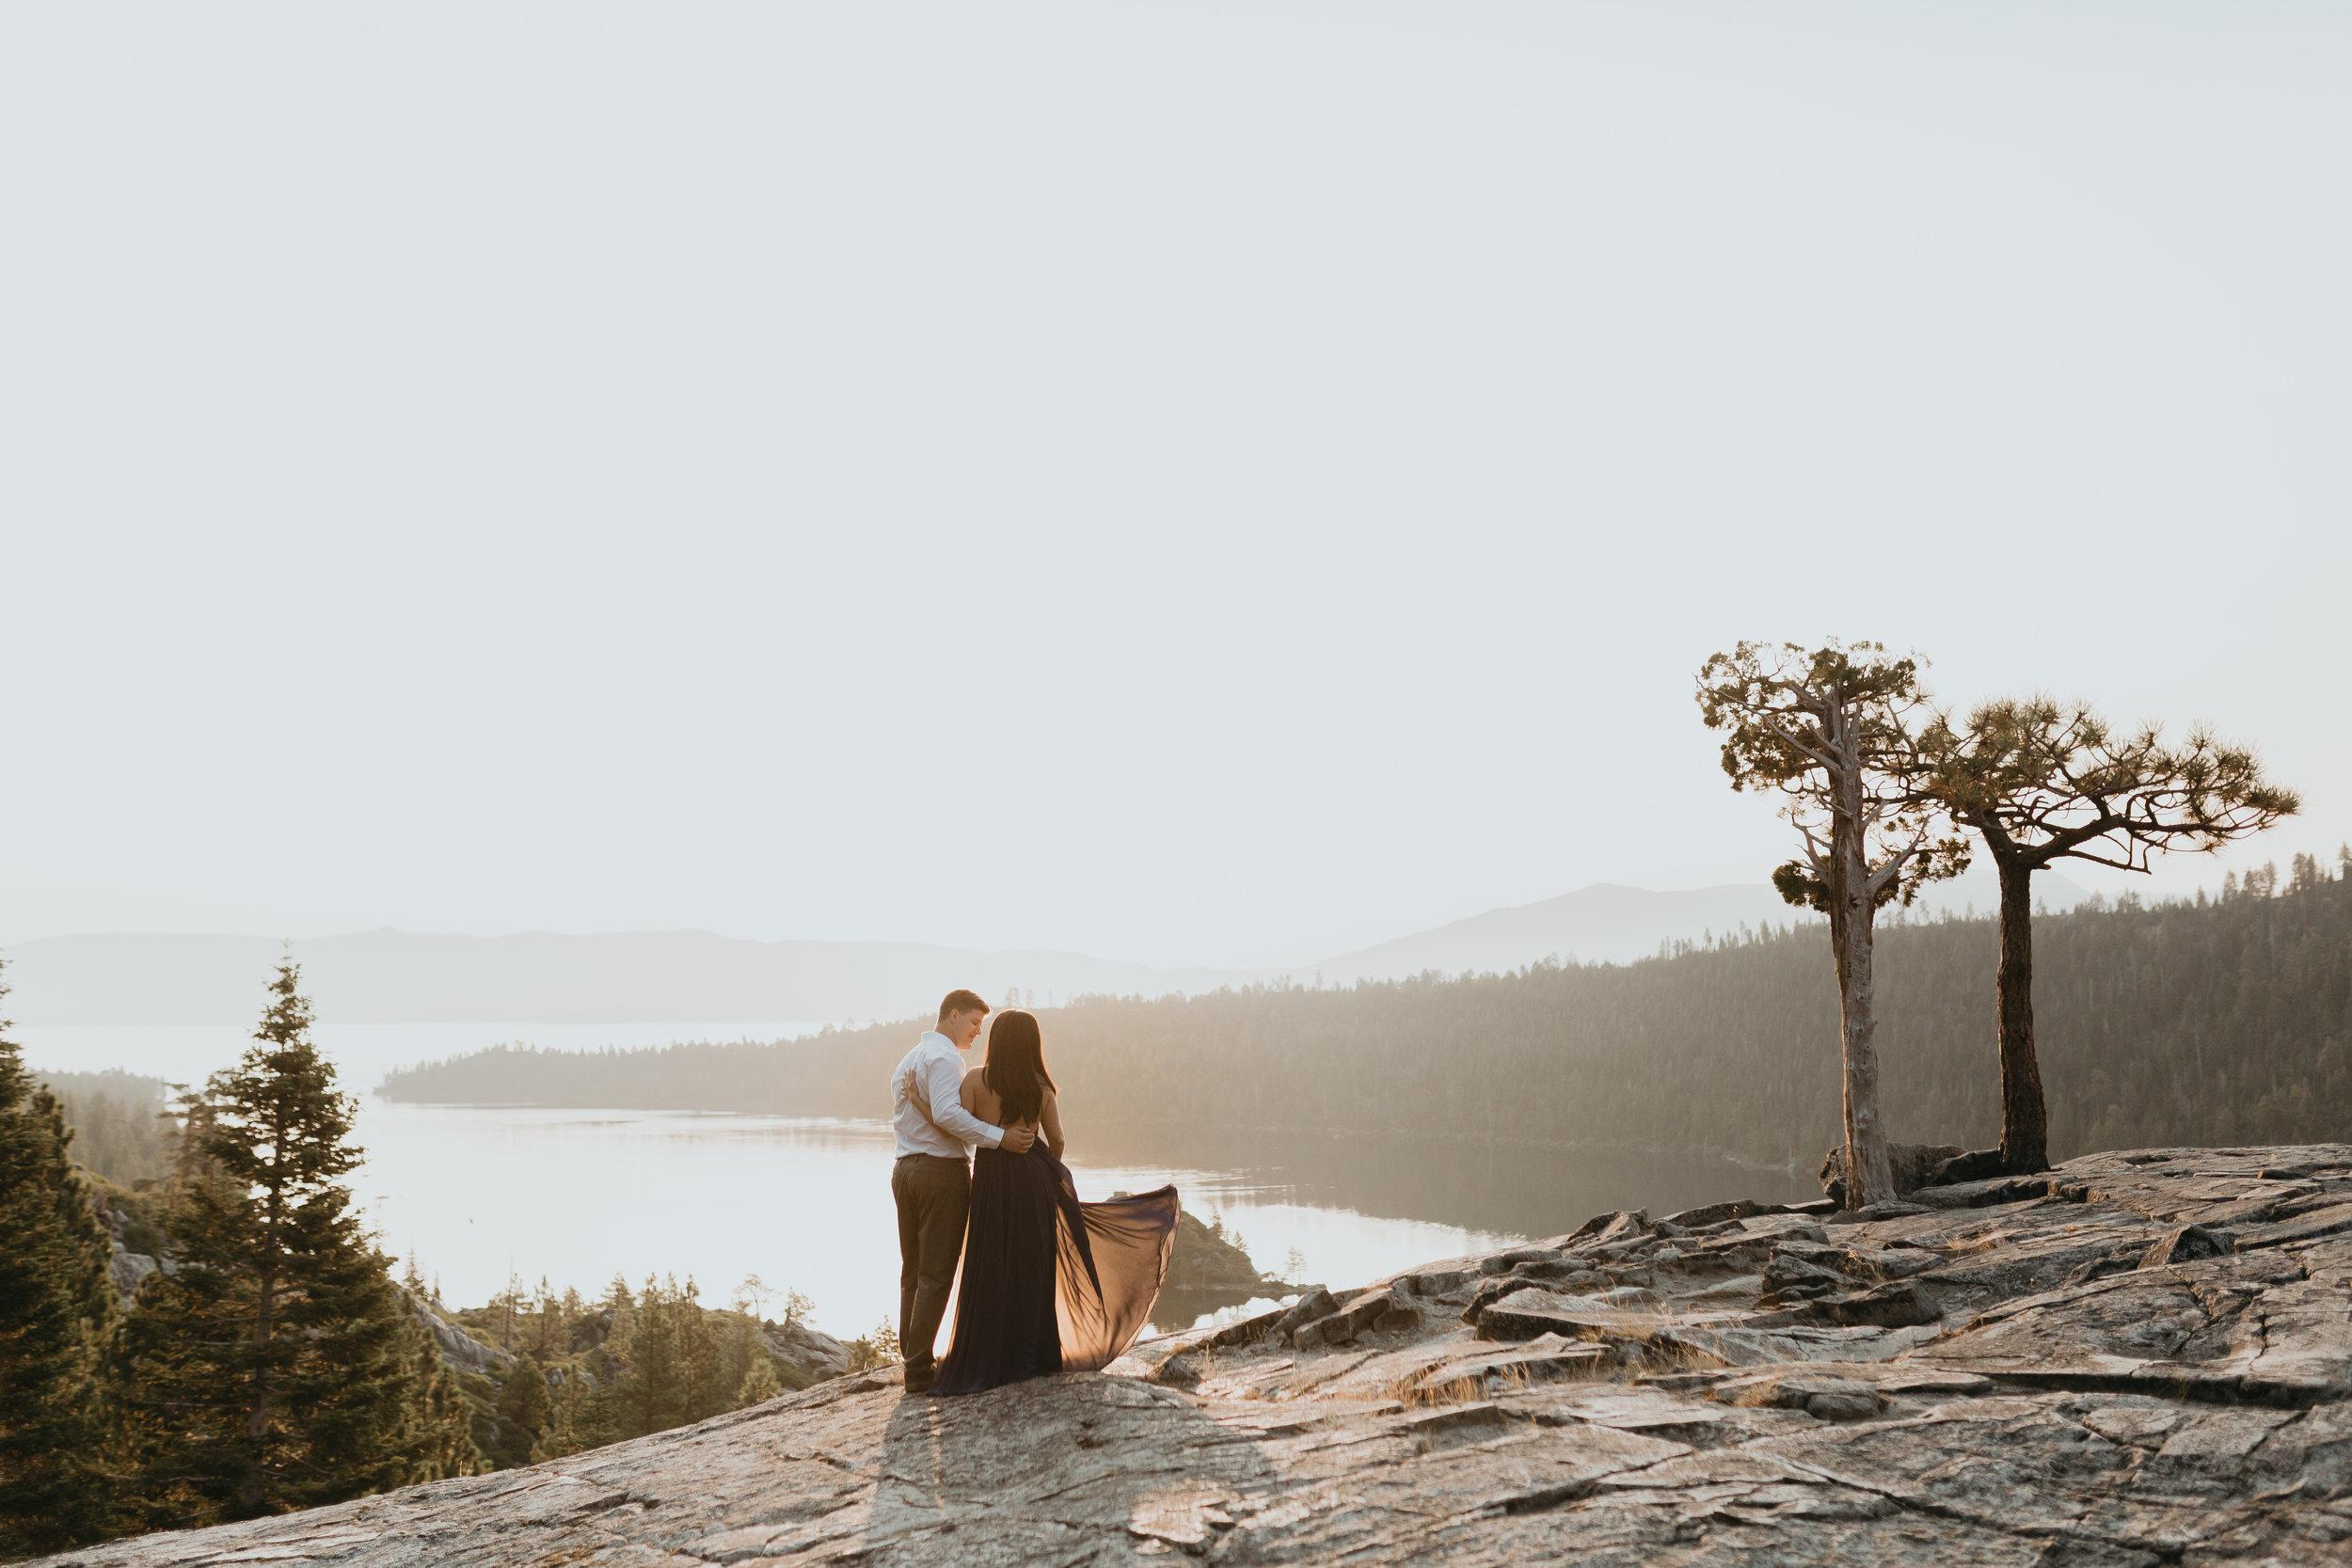 nicole-daacke-photography-lake-tahoe-sunrise-summer-adventure-engagement-photos-nevada-wedding-elopement-photographer-golden-emerald-bay-light-pine-trees-summer-vibe-fun-carefree-authentic-love-32.jpg